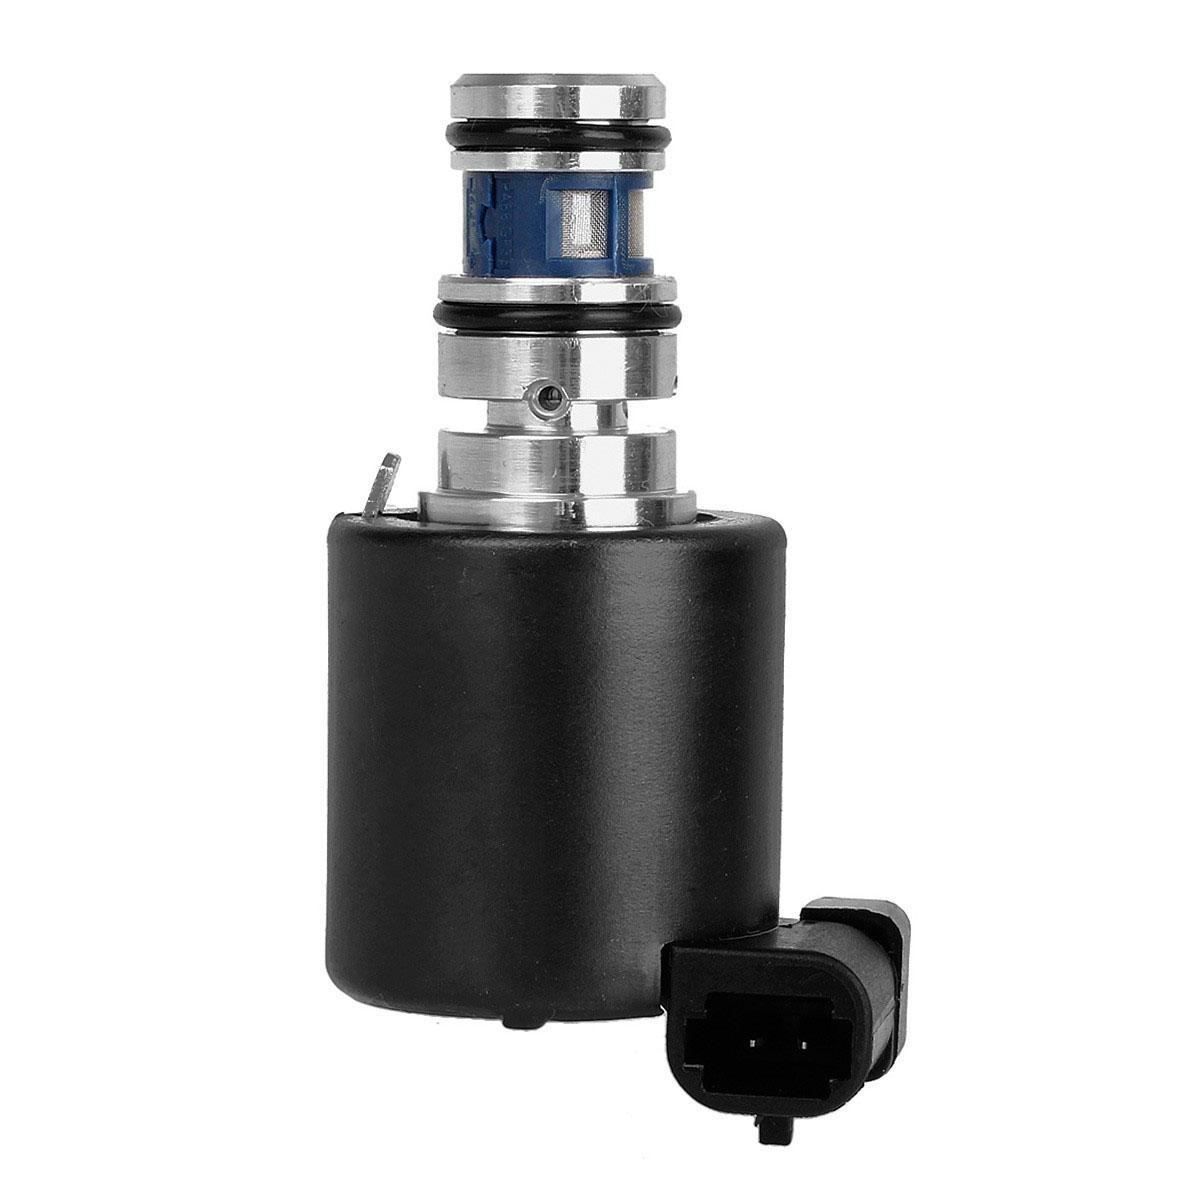 4T65E 24225825 Transmission EPC Pressure Control Solenoid 2003Up